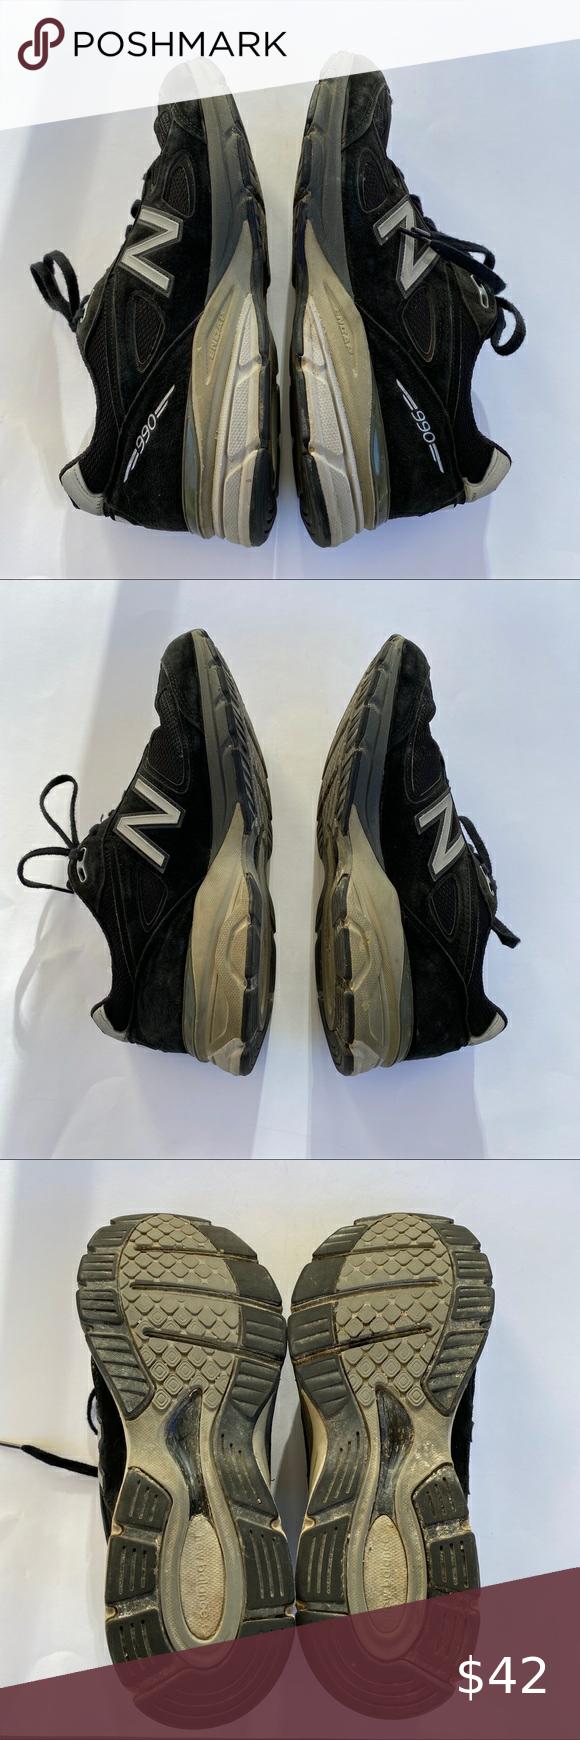 New balance 990 V4 made in USA size 10.5 New balance 990V4 Encap  made in USA  s…